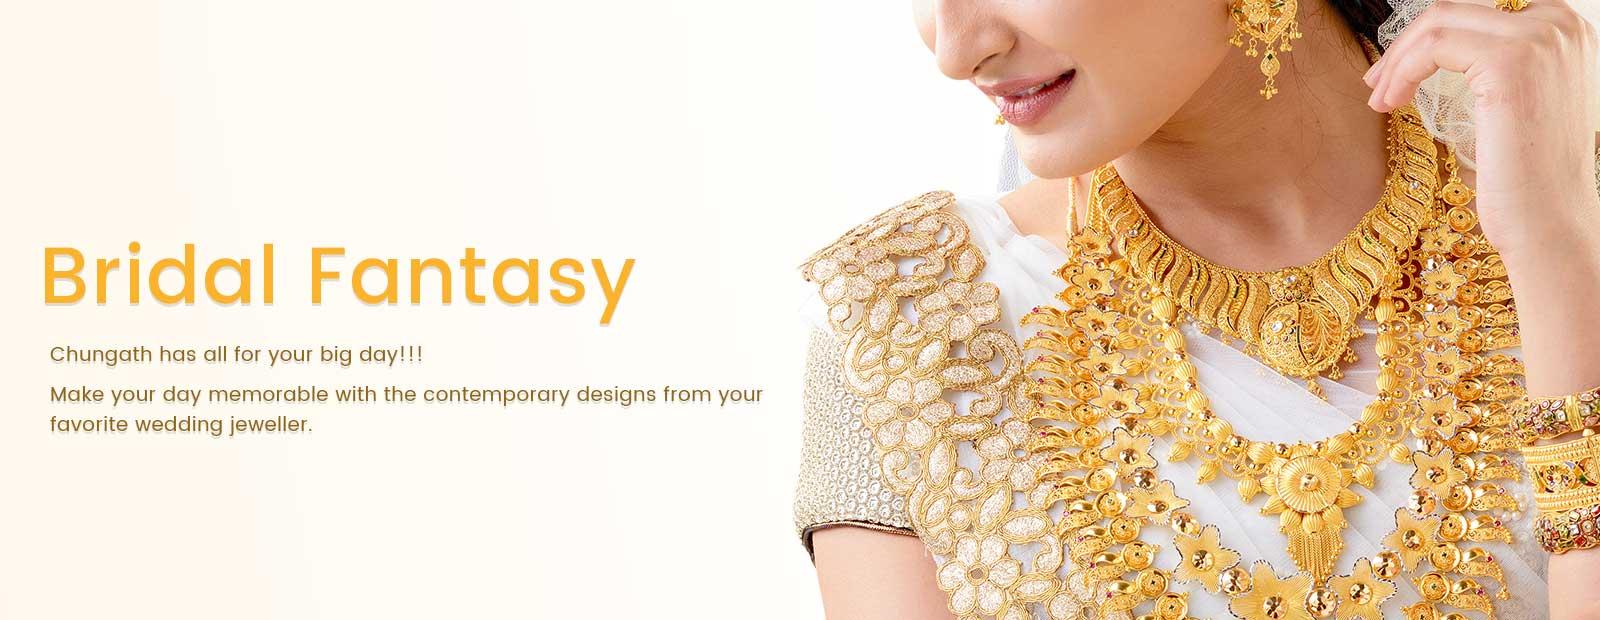 Chungath Gold & Diamonds